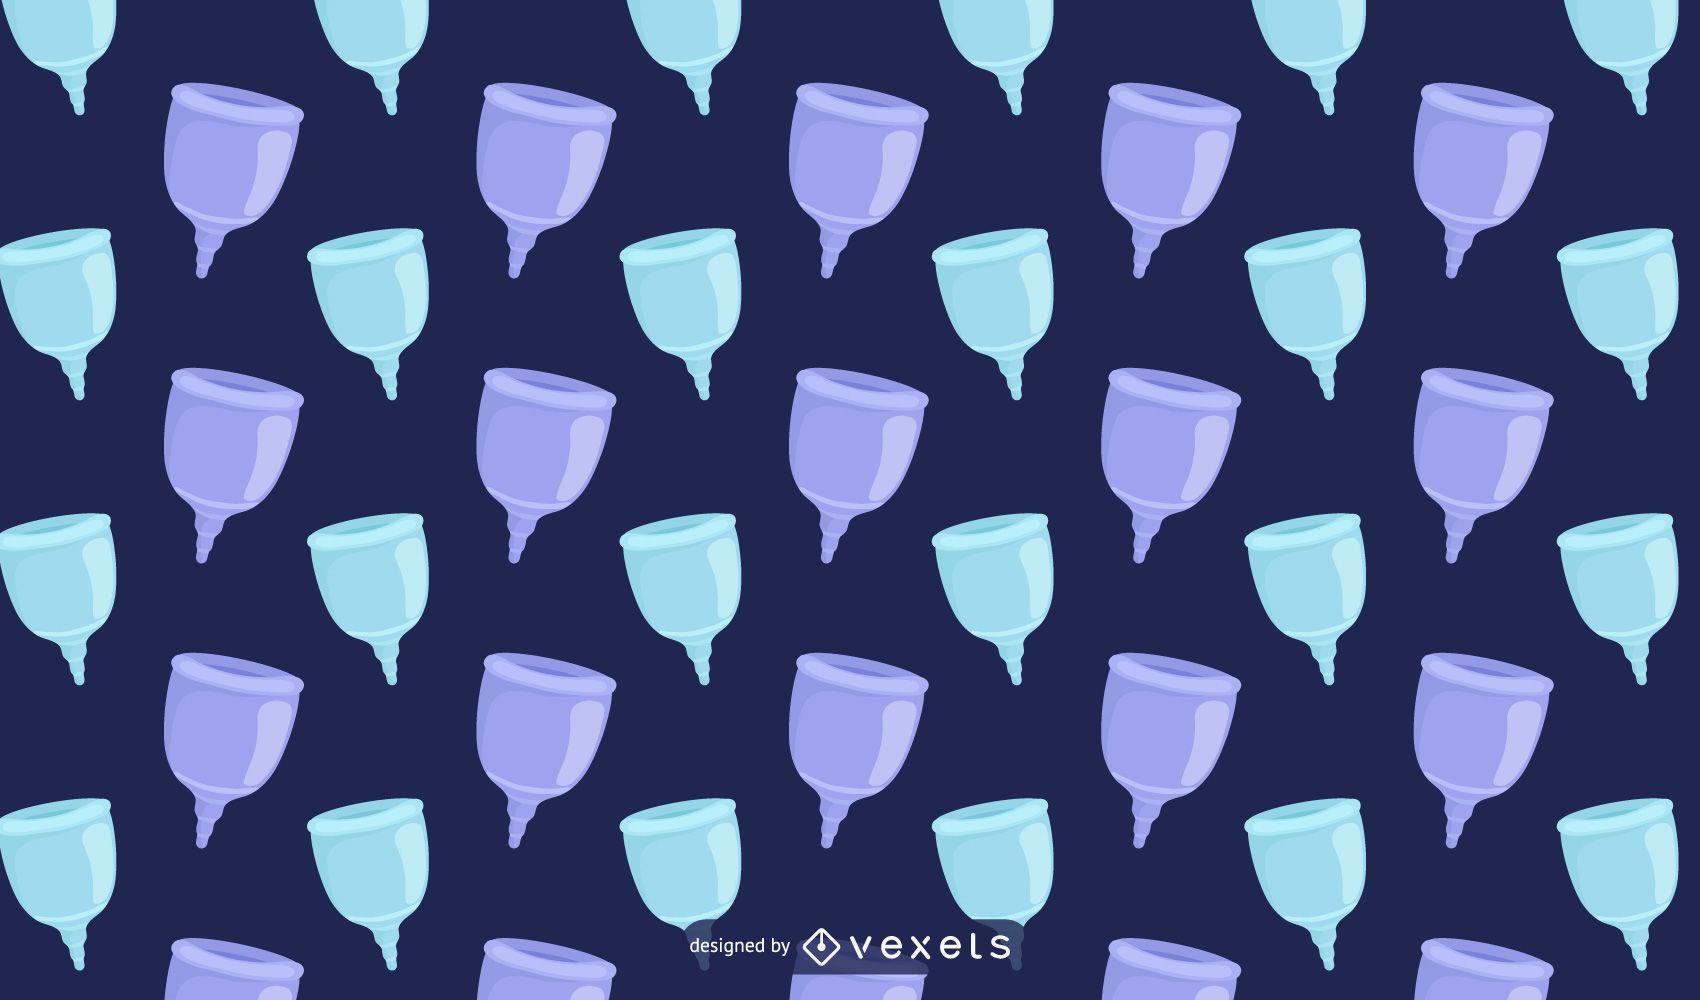 Ecologic menstrual cup pattern design